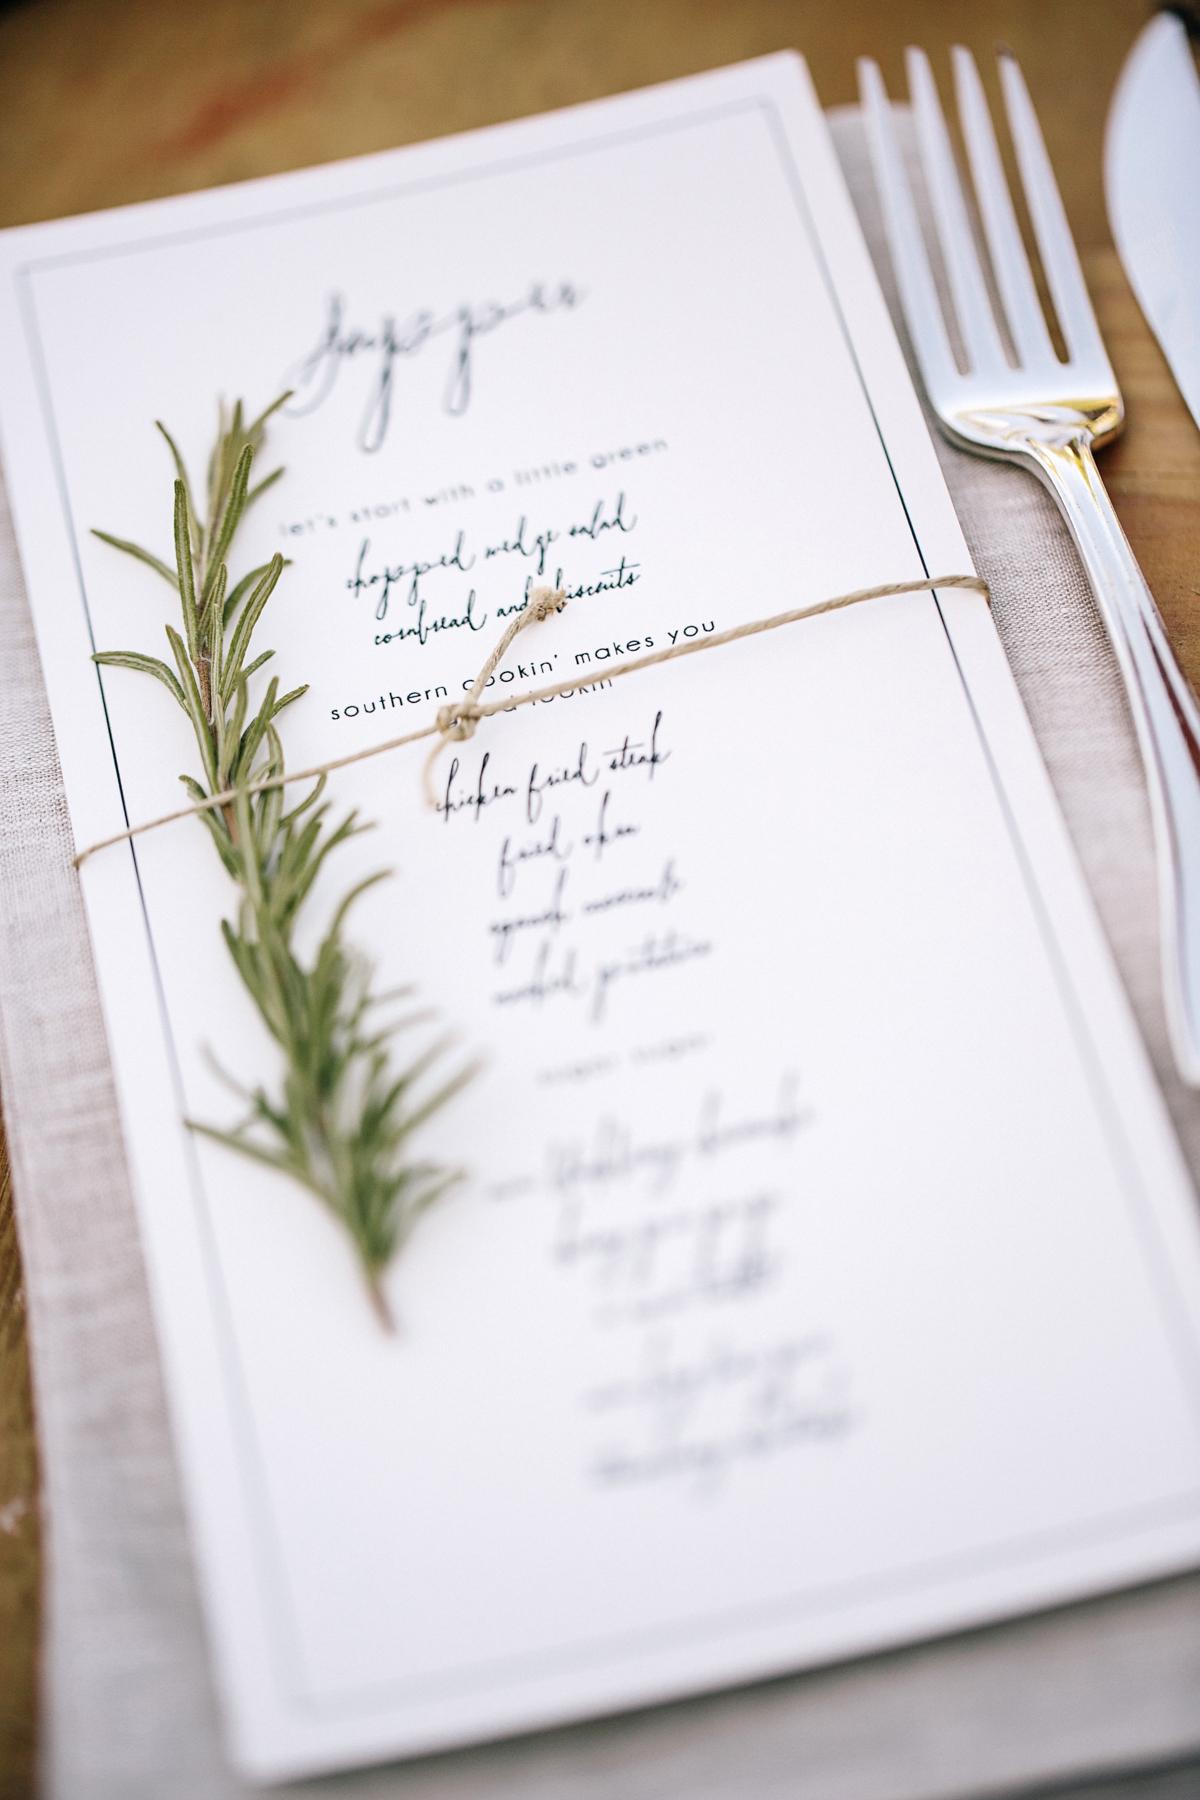 Creative and unique wedding reception menu designs inside weddings 11 creative reception menu designs for your wedding junglespirit Gallery